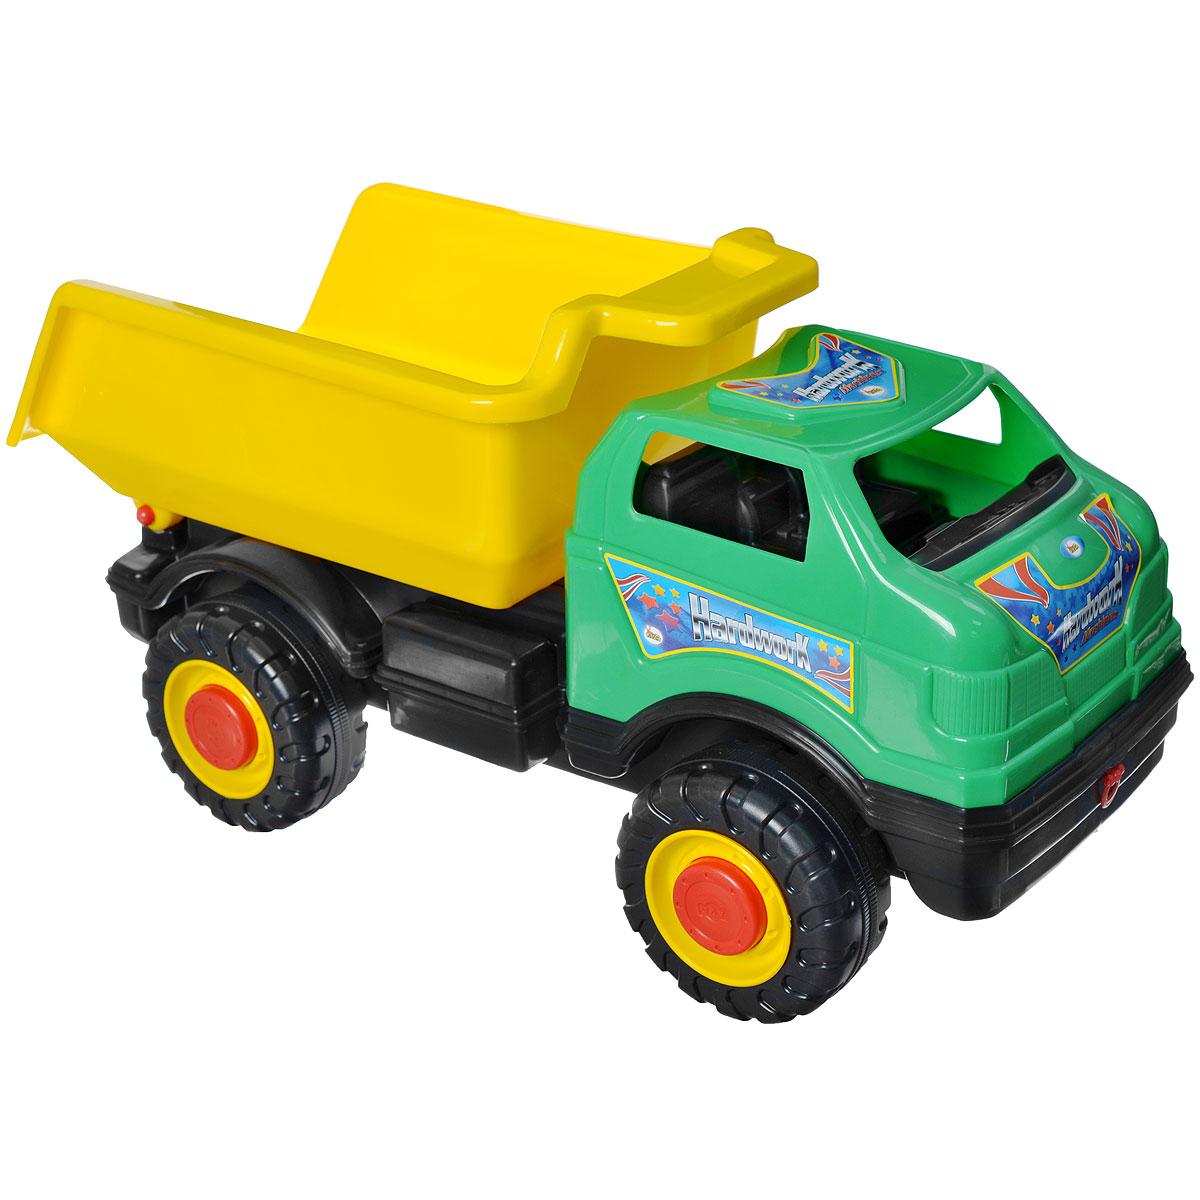 AVC Супергрузовик цвет желтый зеленый 01/5151